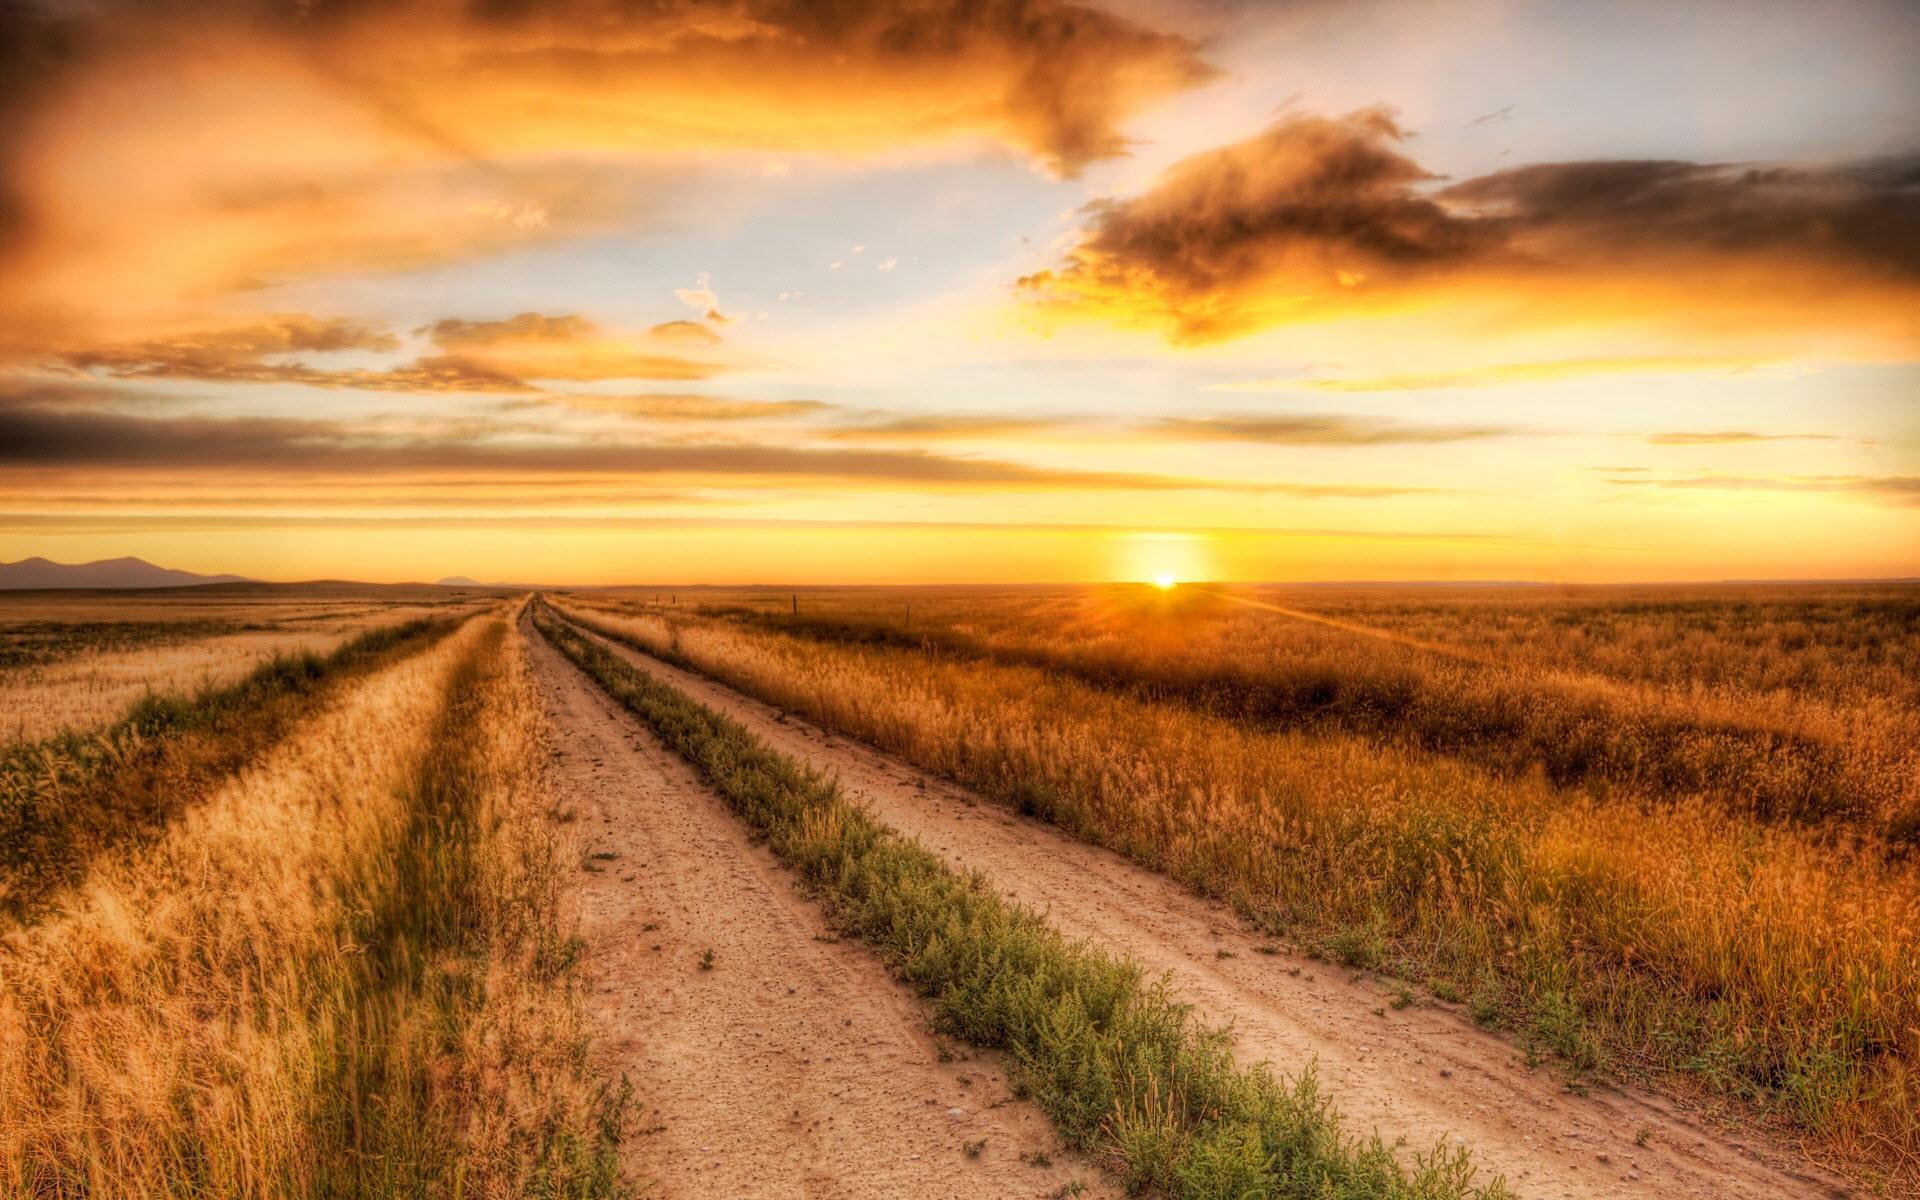 road country images desctopwalls 1920x1200